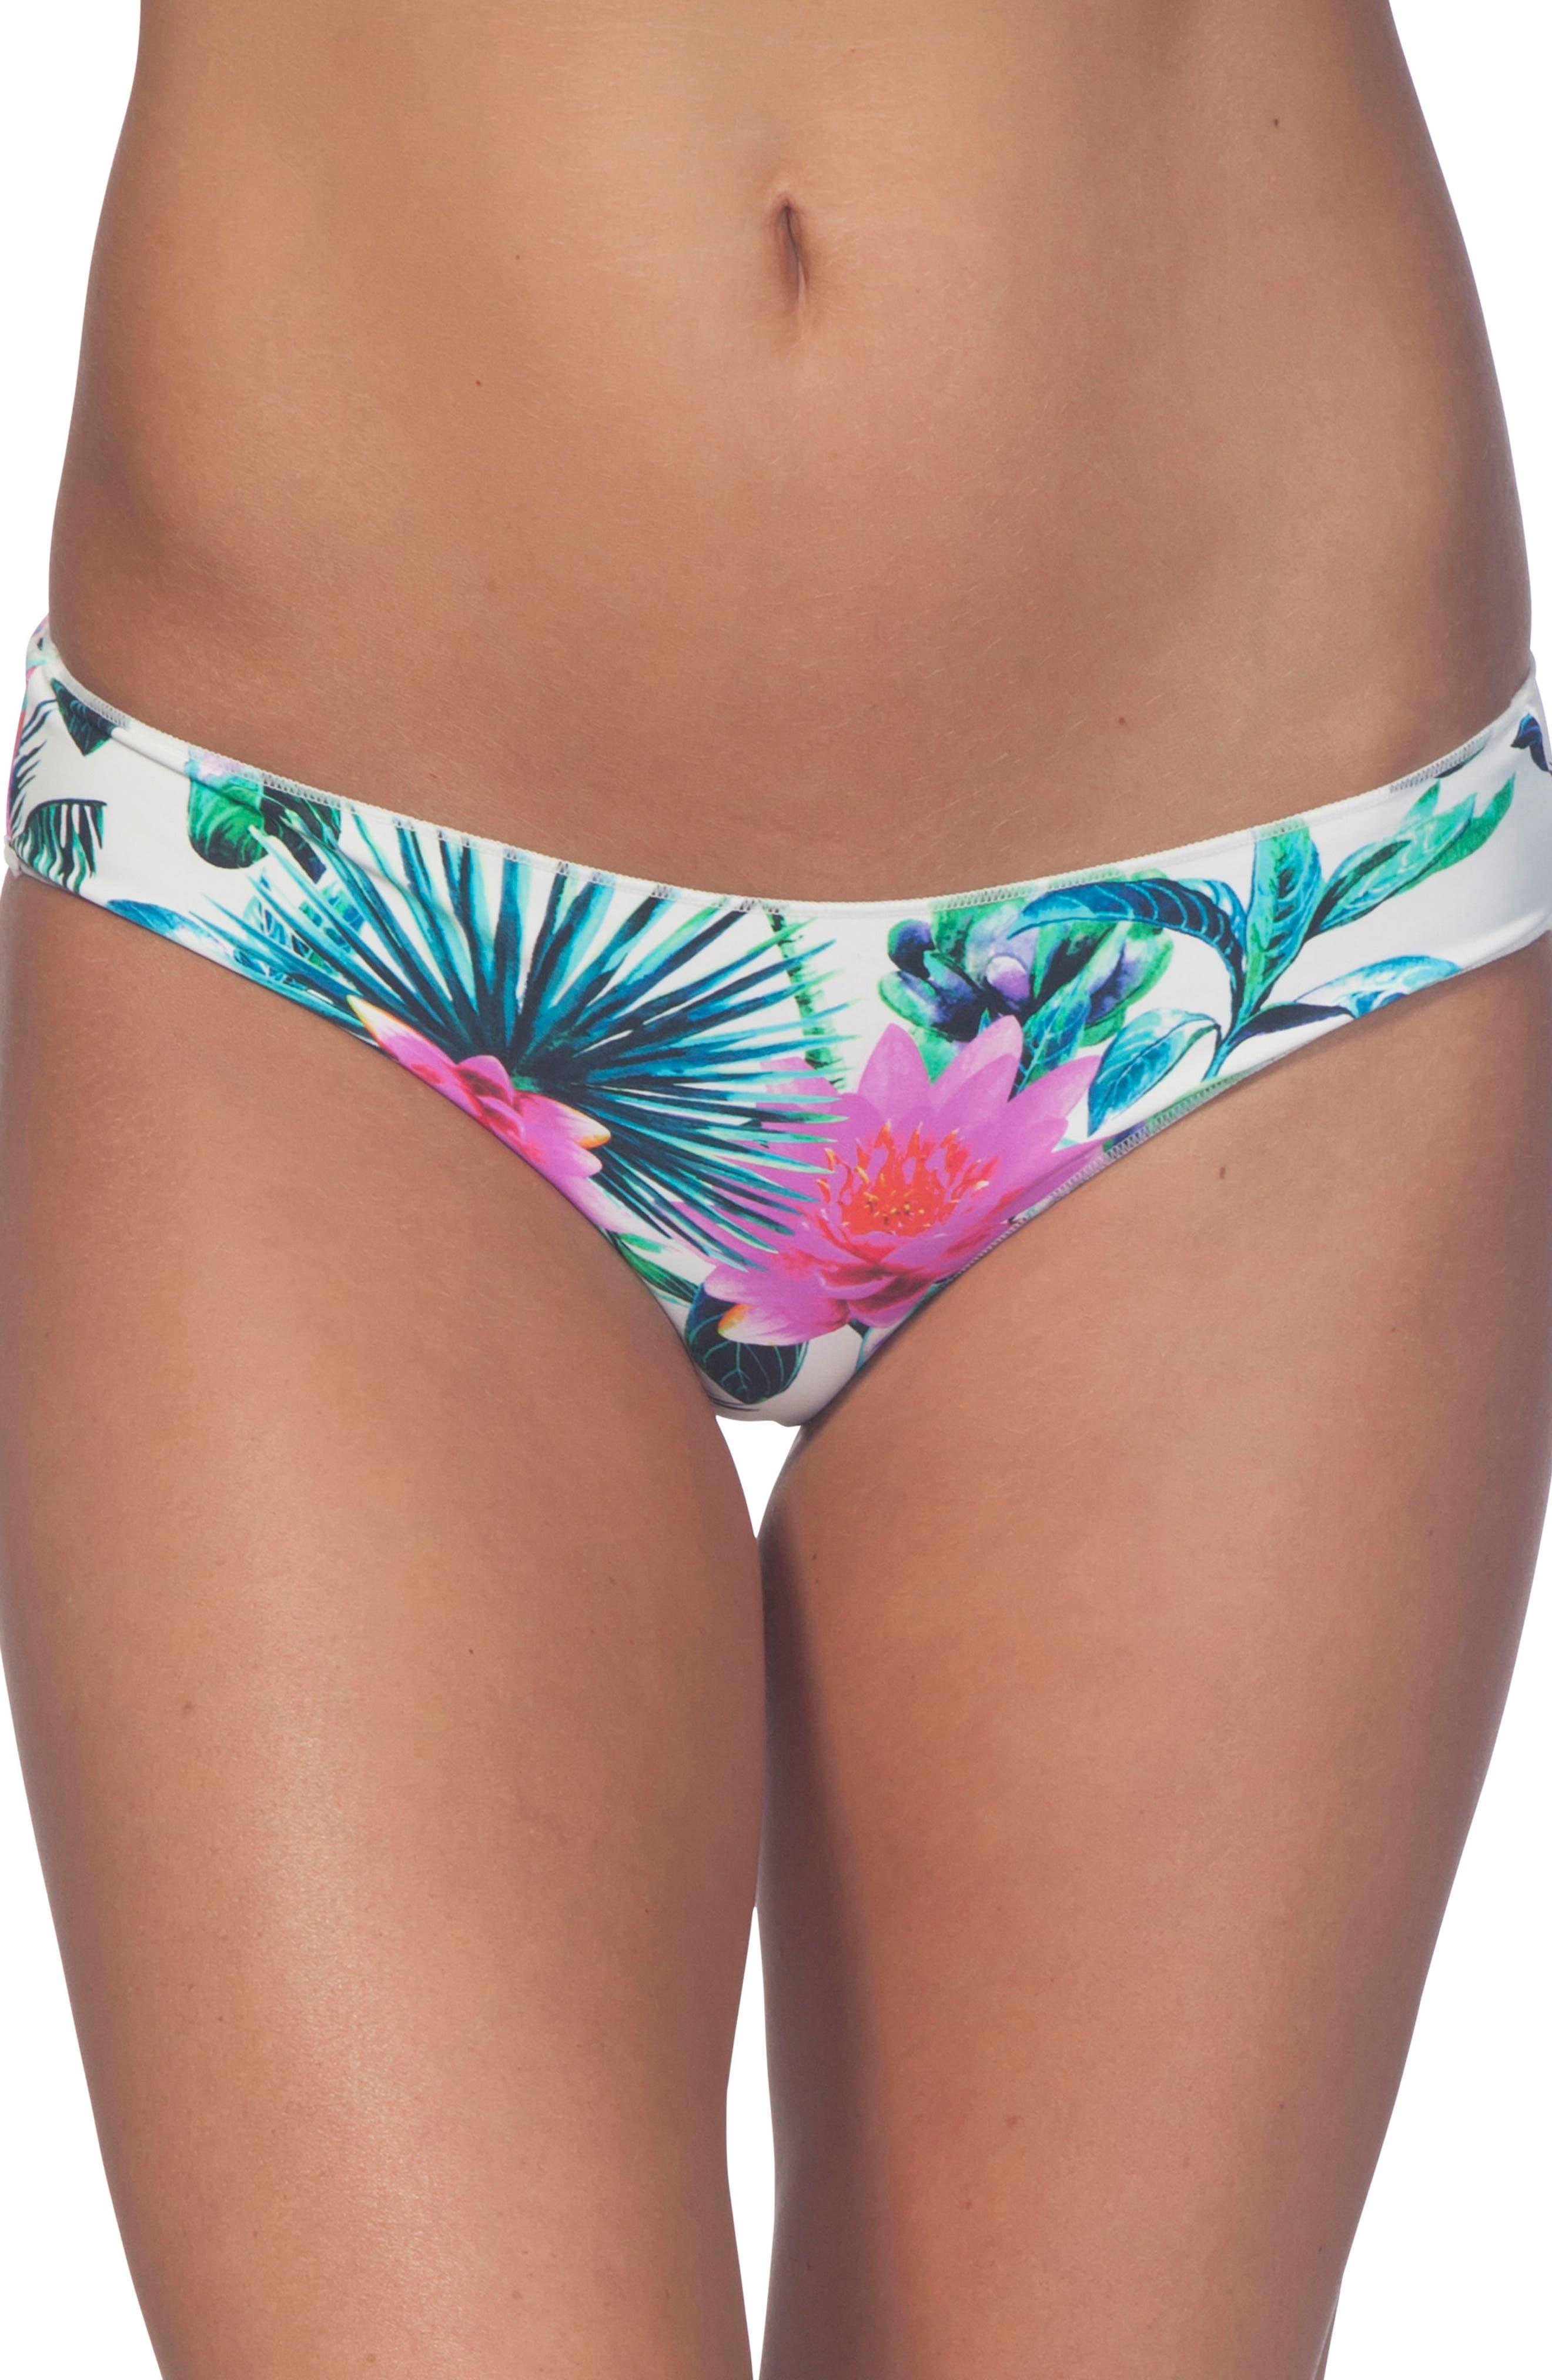 Palms Away Hipster Bikini Bottoms,                             Main thumbnail 1, color,                             100